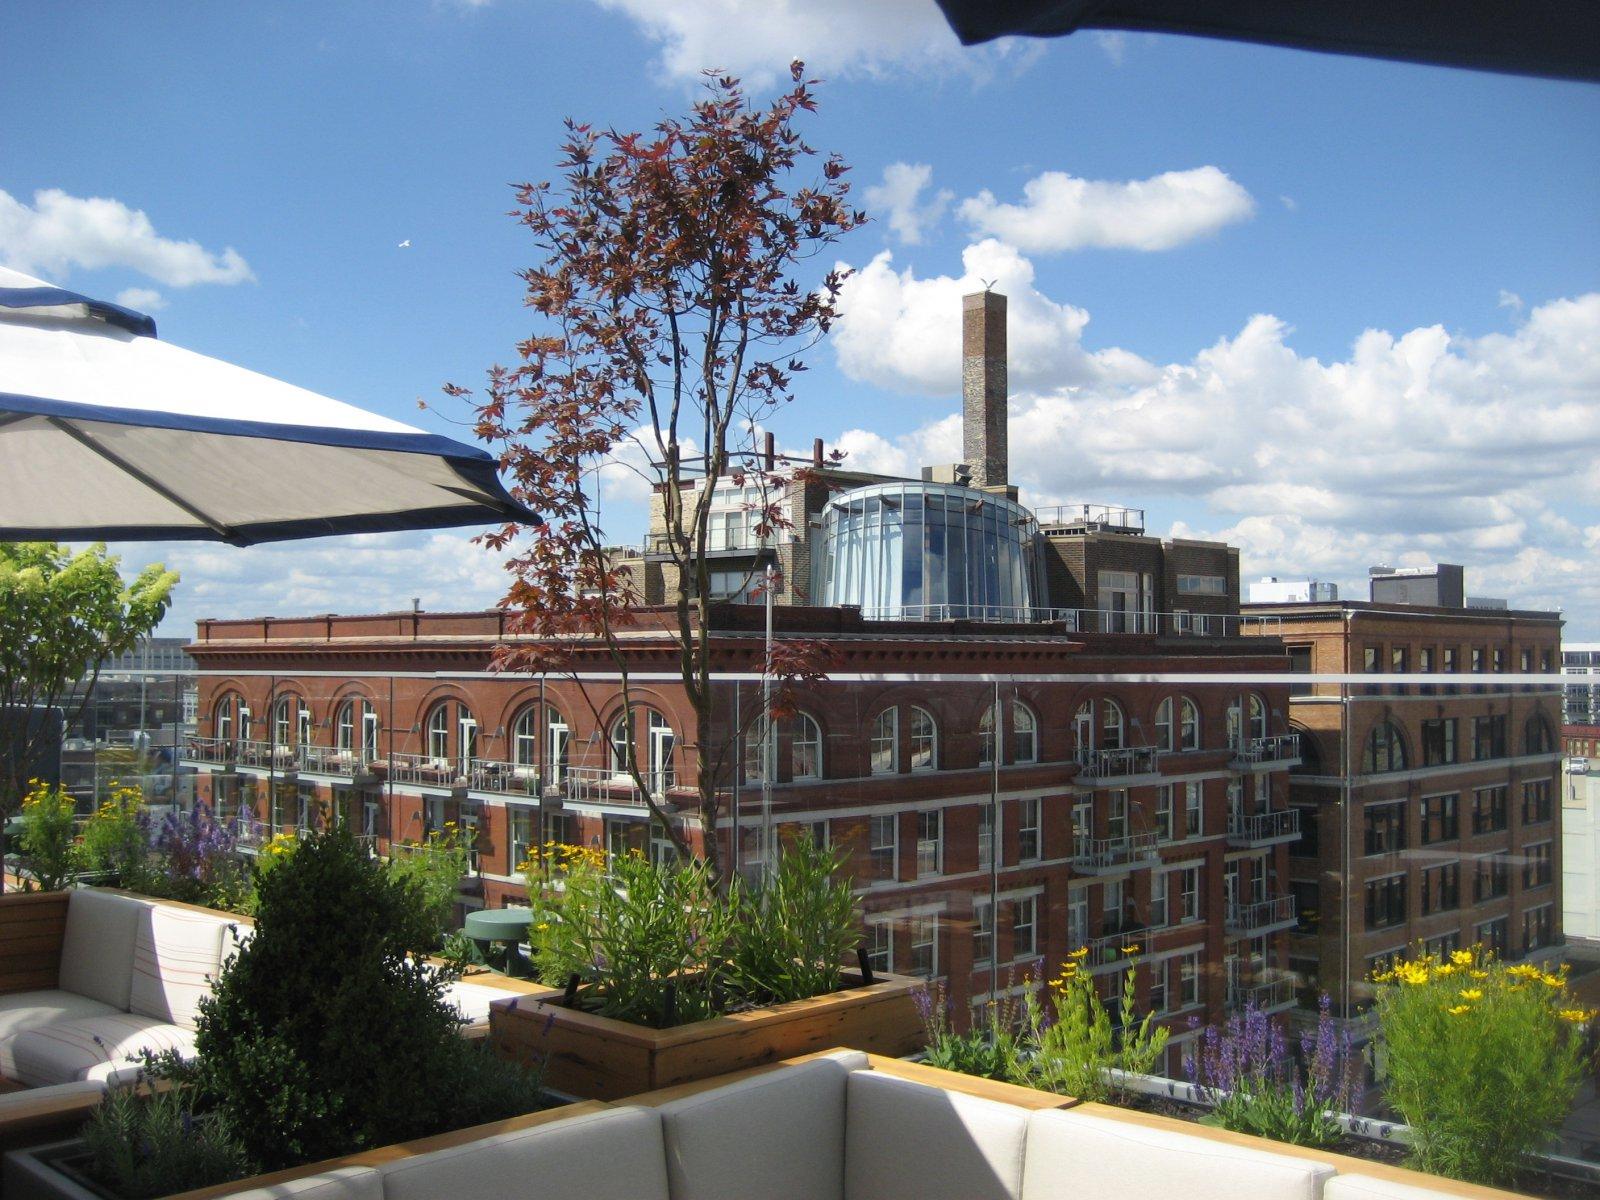 Robert Joseph\'s rooftop aerie